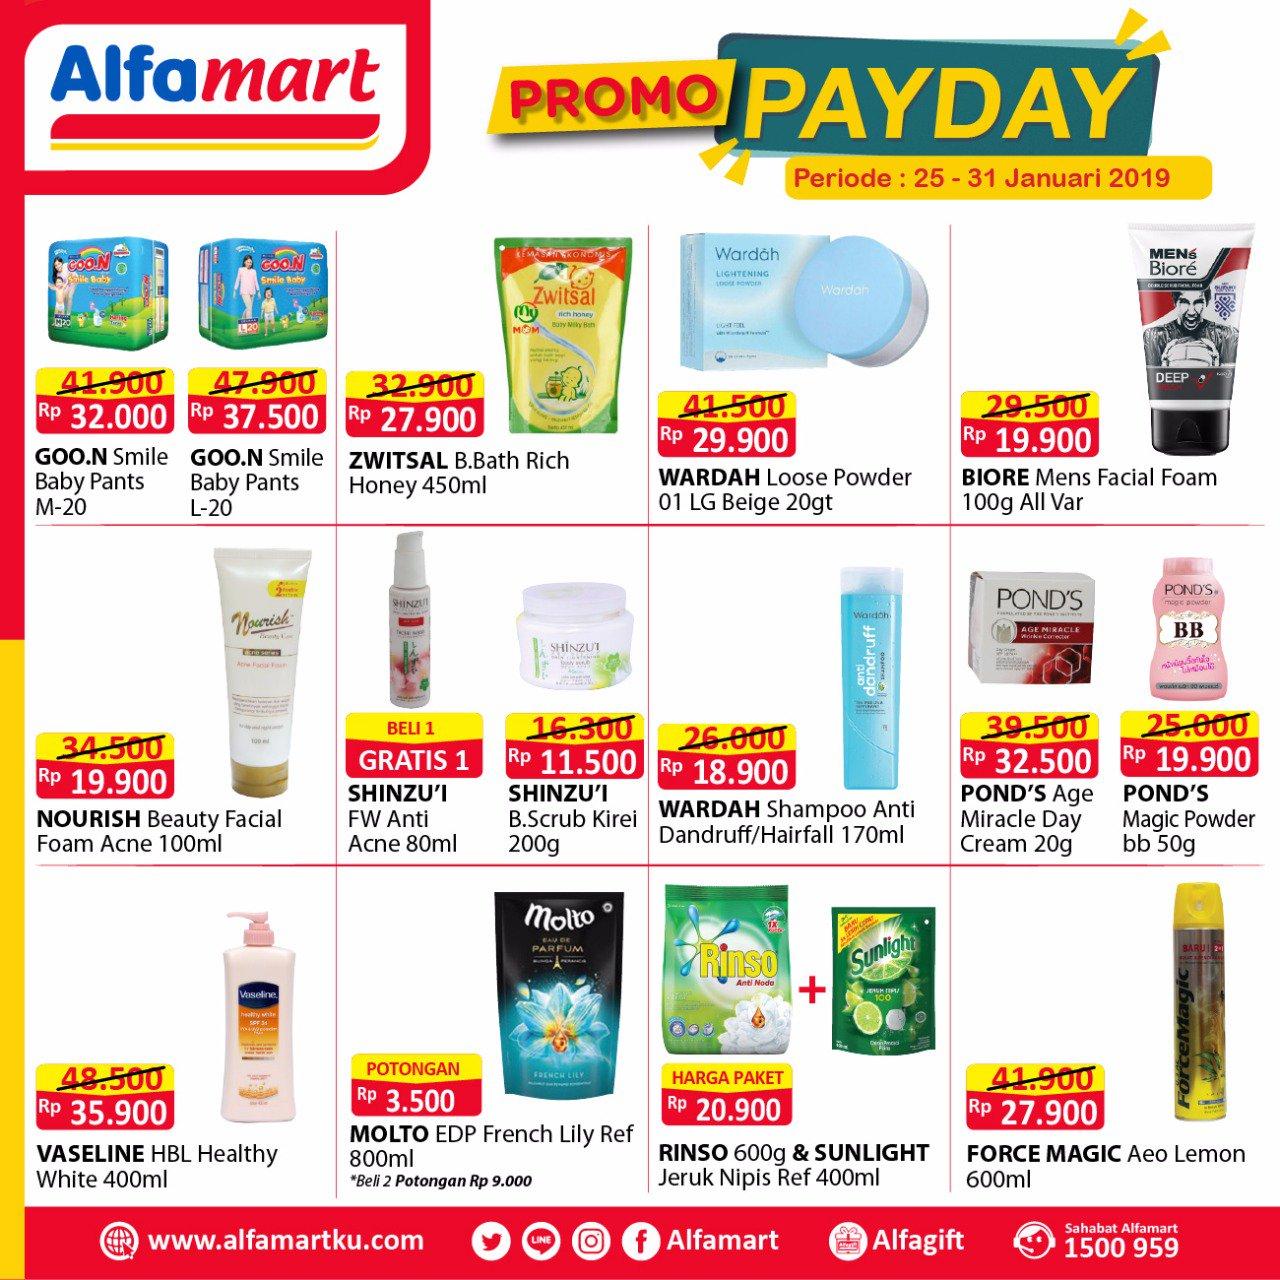 Alfamart On Twitter Promo Payday Telah Tiba Segera Dapatkan Harga Serba Murahnya Cuma Di Alfamart Periode 25 31 Januari 2019